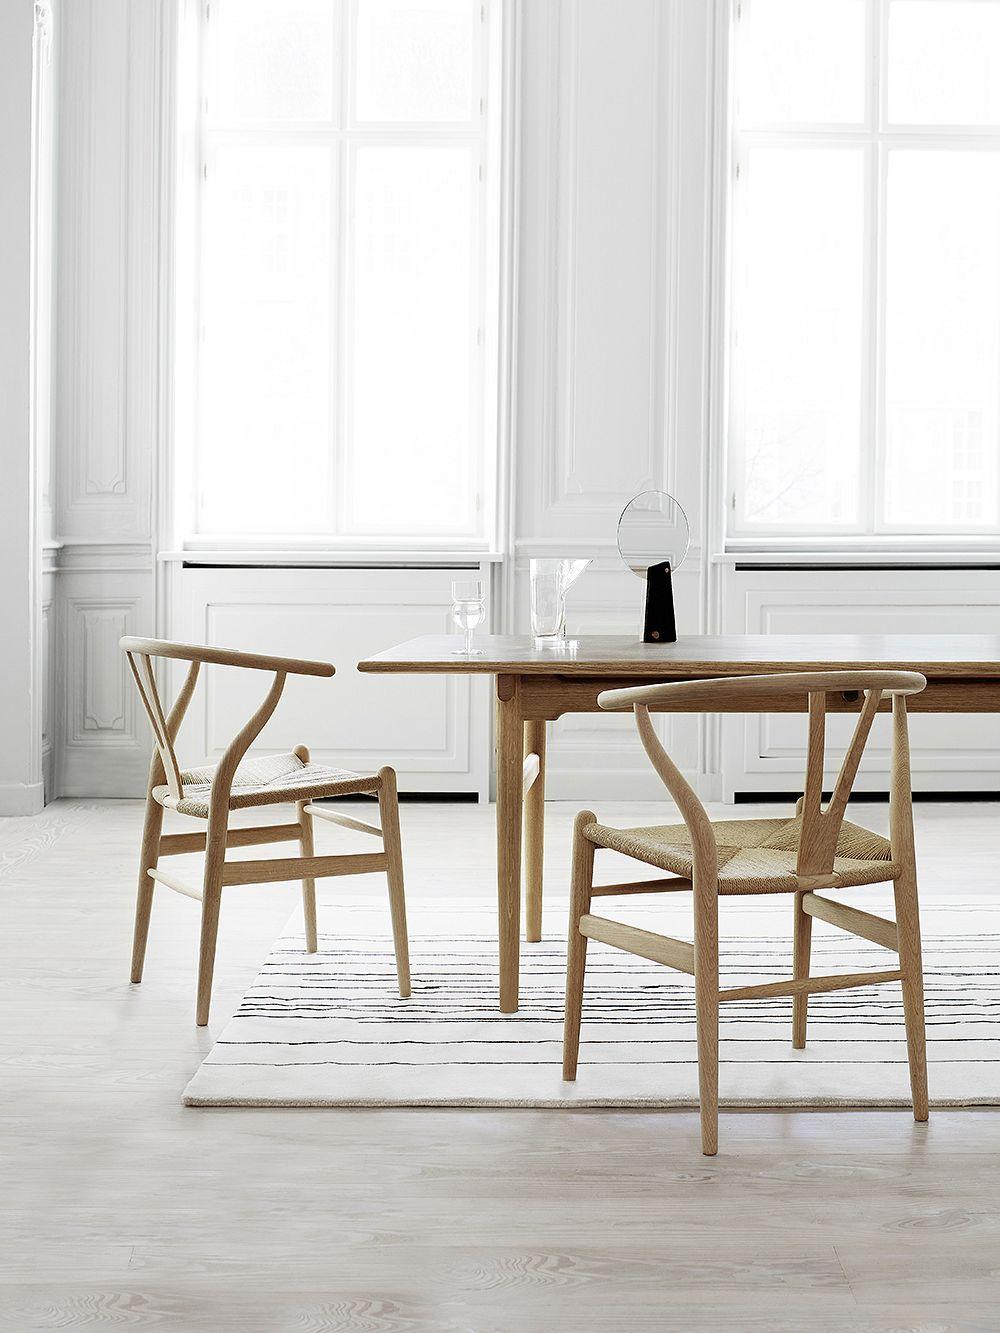 Carl Hansen & Søn CH24 Wishbone tuoli, saippuoitu tammi - paperinaru